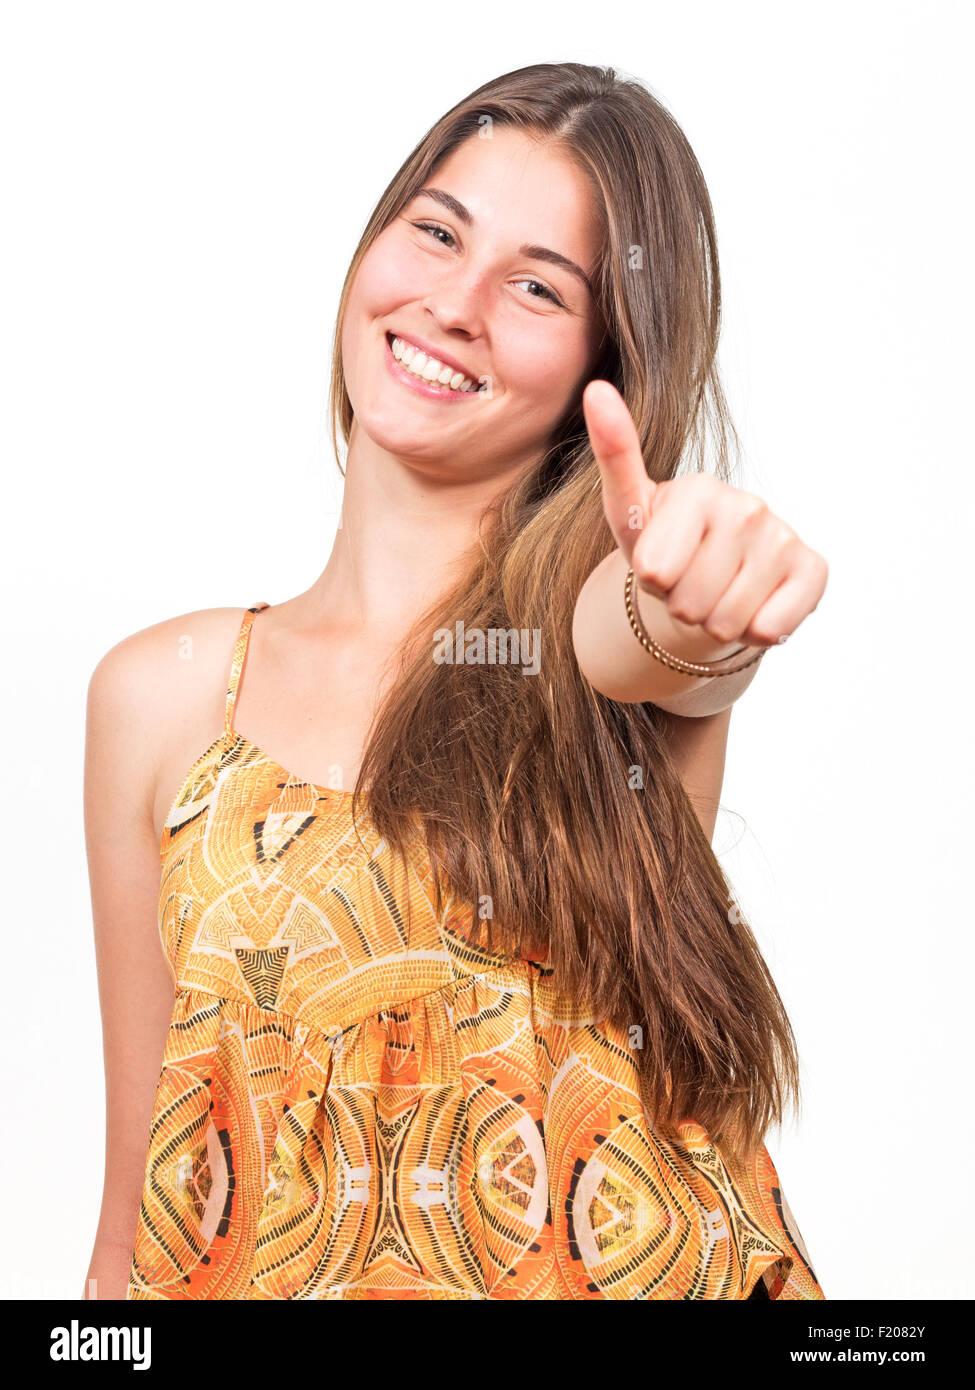 Junge Frau contenção mit dem Daumen nach oben Imagens de Stock